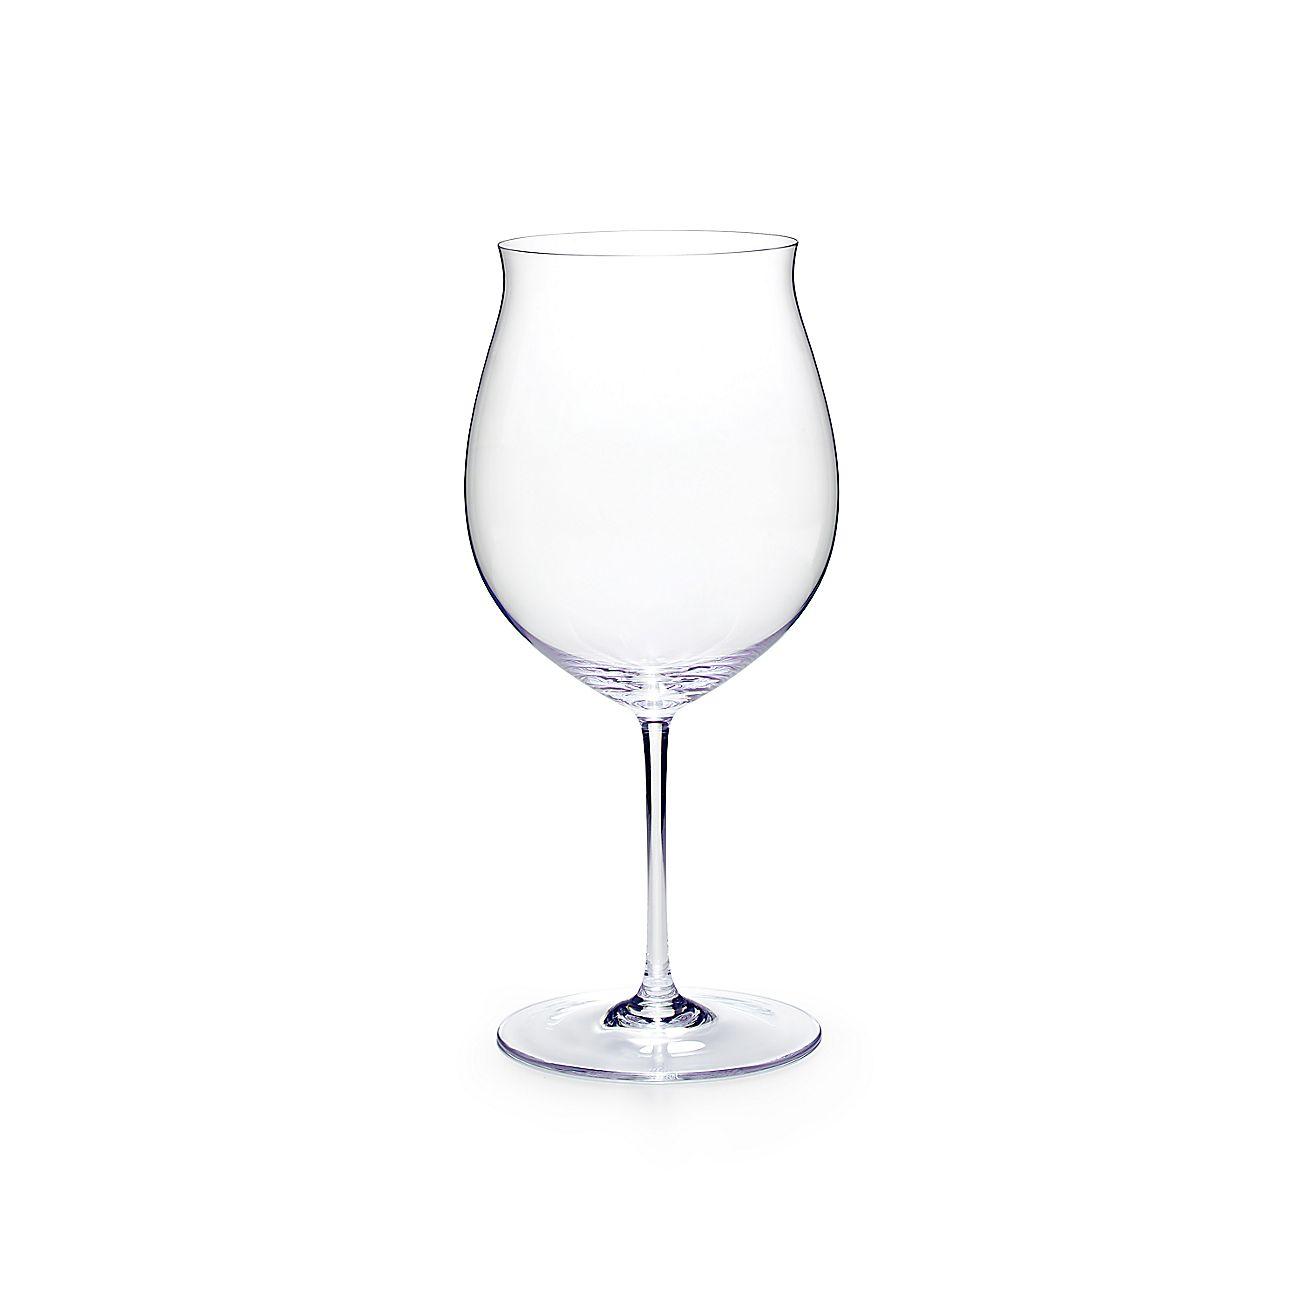 Riedel:Sommeliers Burgundy<br>Grand Cru Wine Glass